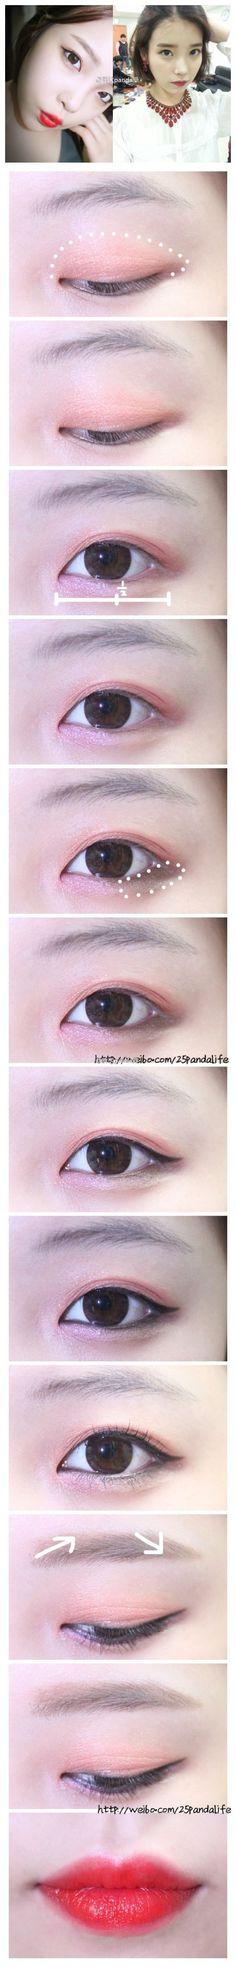 Korean make up Asian Makeup Looks, Korean Makeup Look, Asian Eye Makeup, Makeup Inspo, Makeup Inspiration, Makeup Tips, Beauty Makeup, Korean Makeup Tutorials, Beauty Tutorials